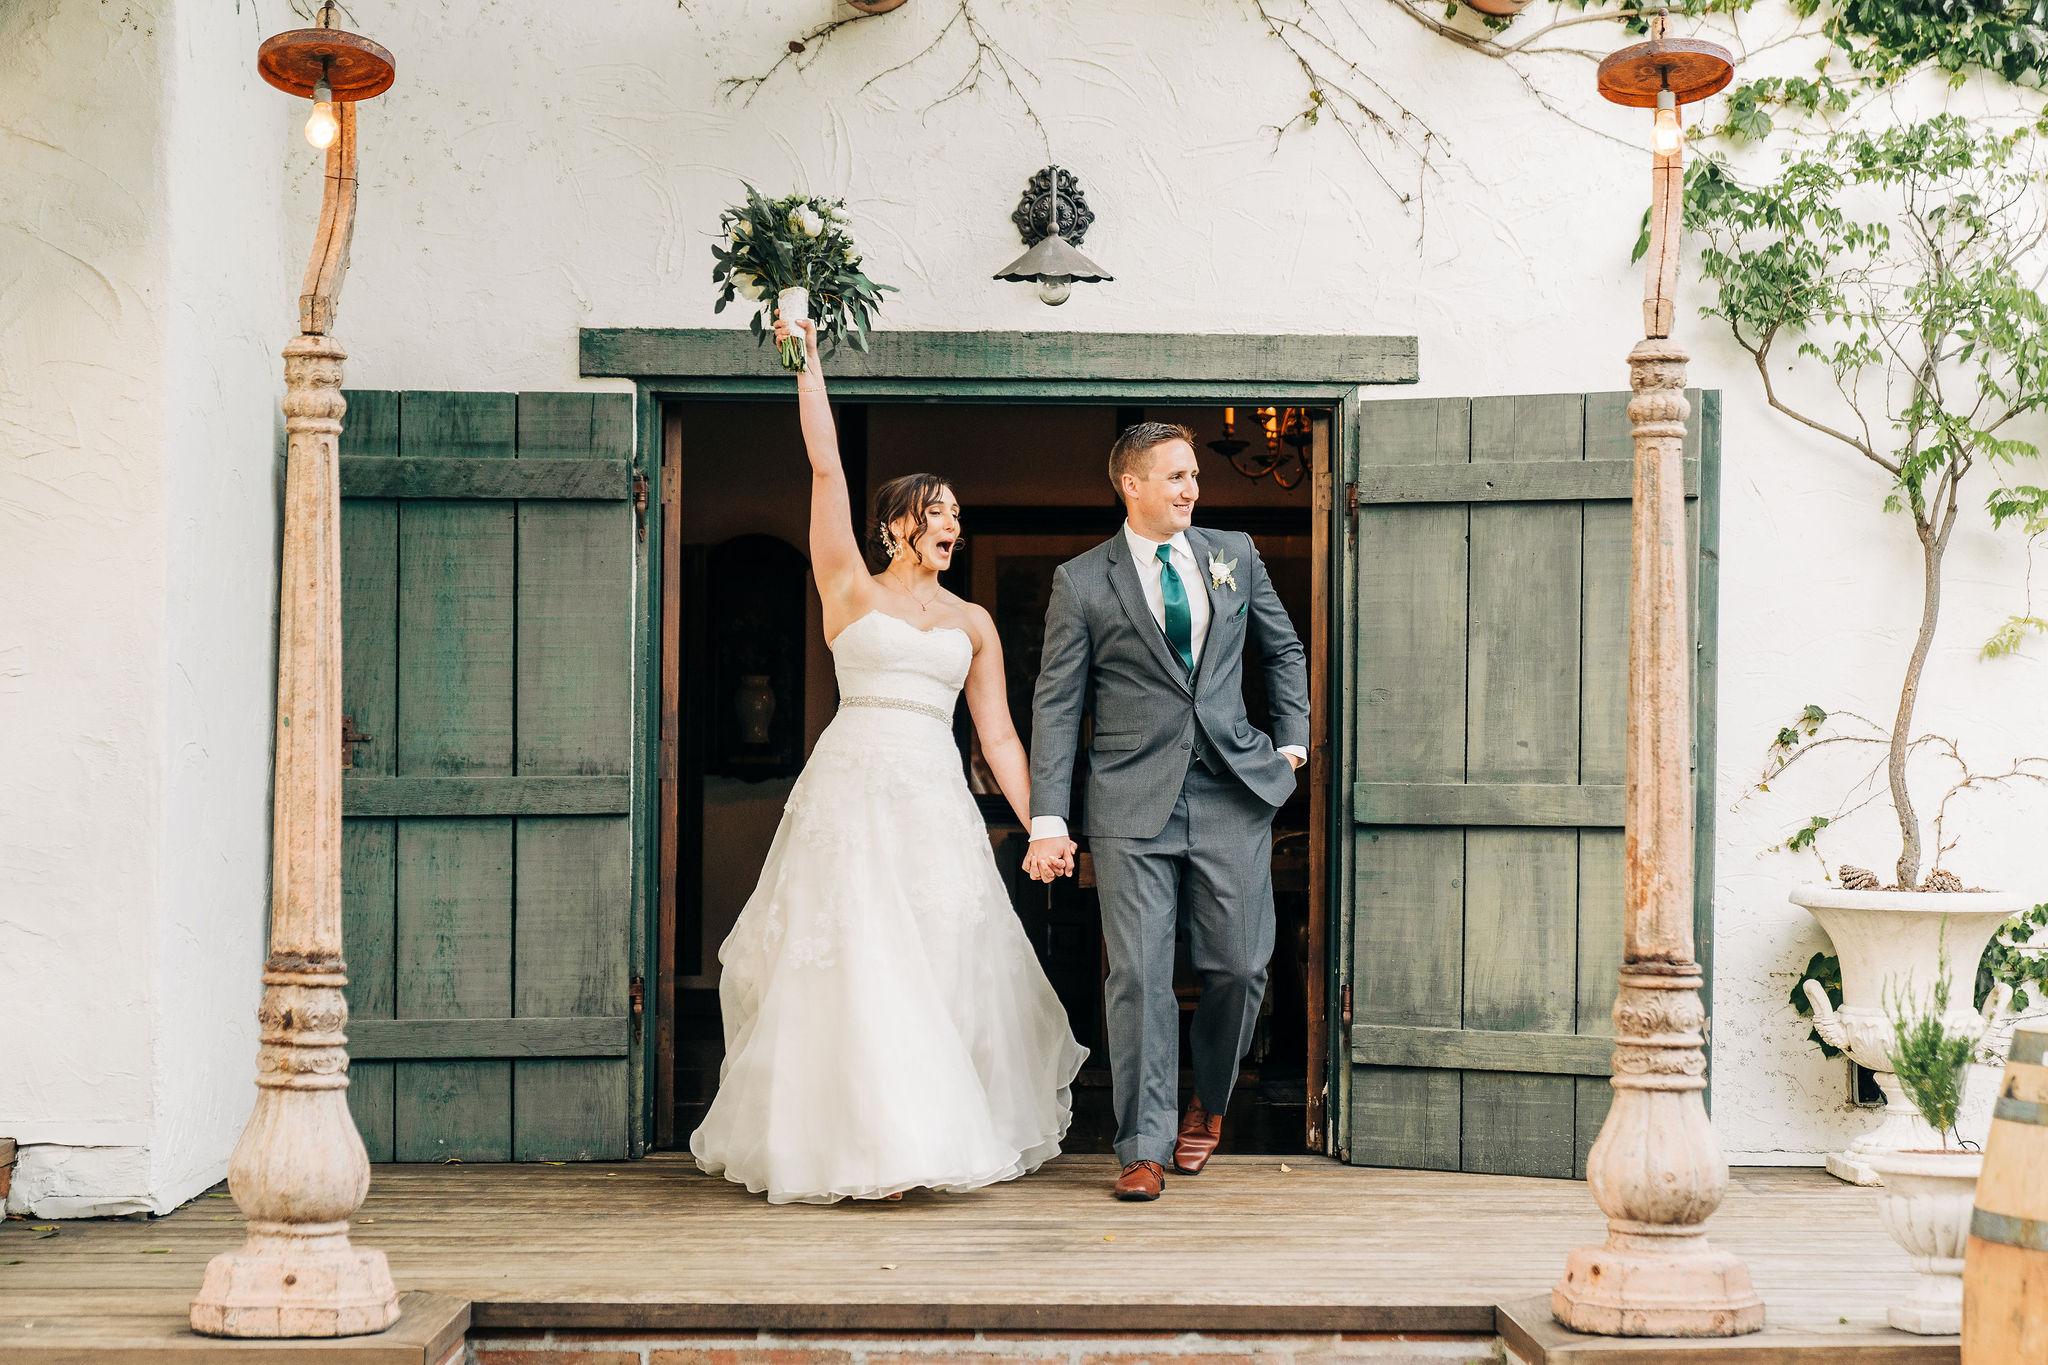 the-villa-san-juan-capistrano-wedding-094.jpg